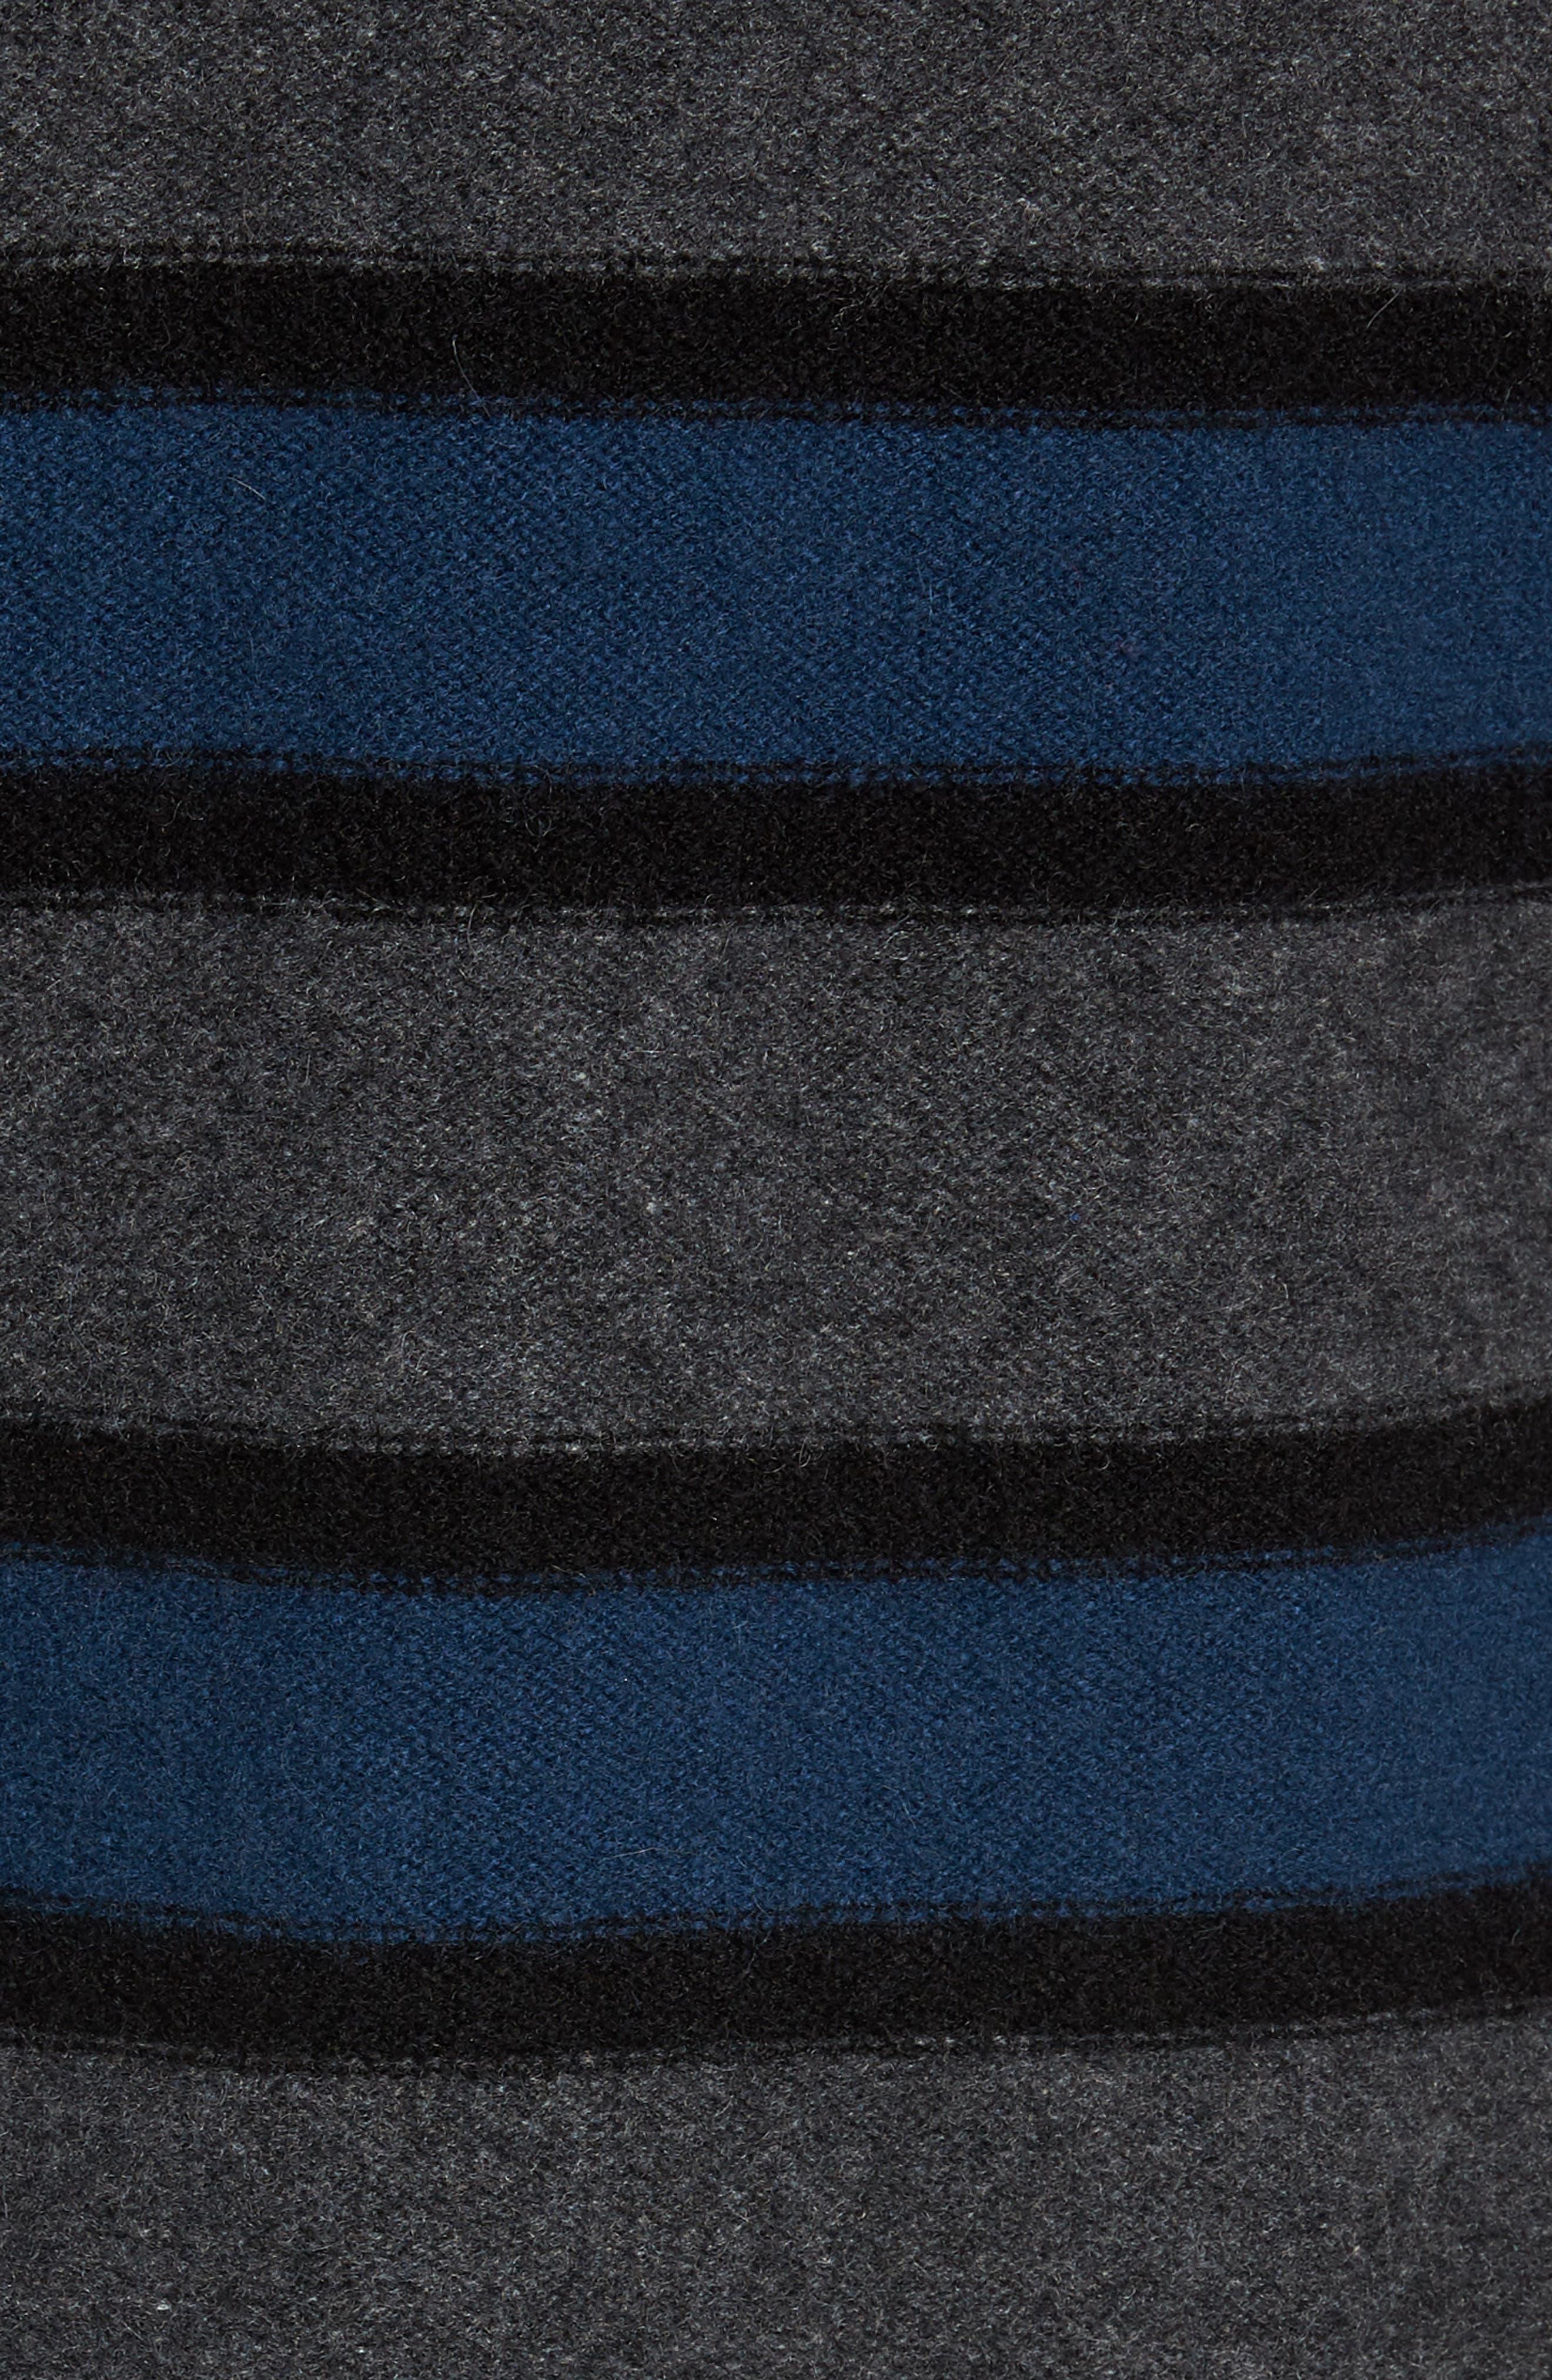 Regular Fit Stripe Cashmere Sweater,                             Alternate thumbnail 5, color,                             DARK HEATHER GREY/BLUE